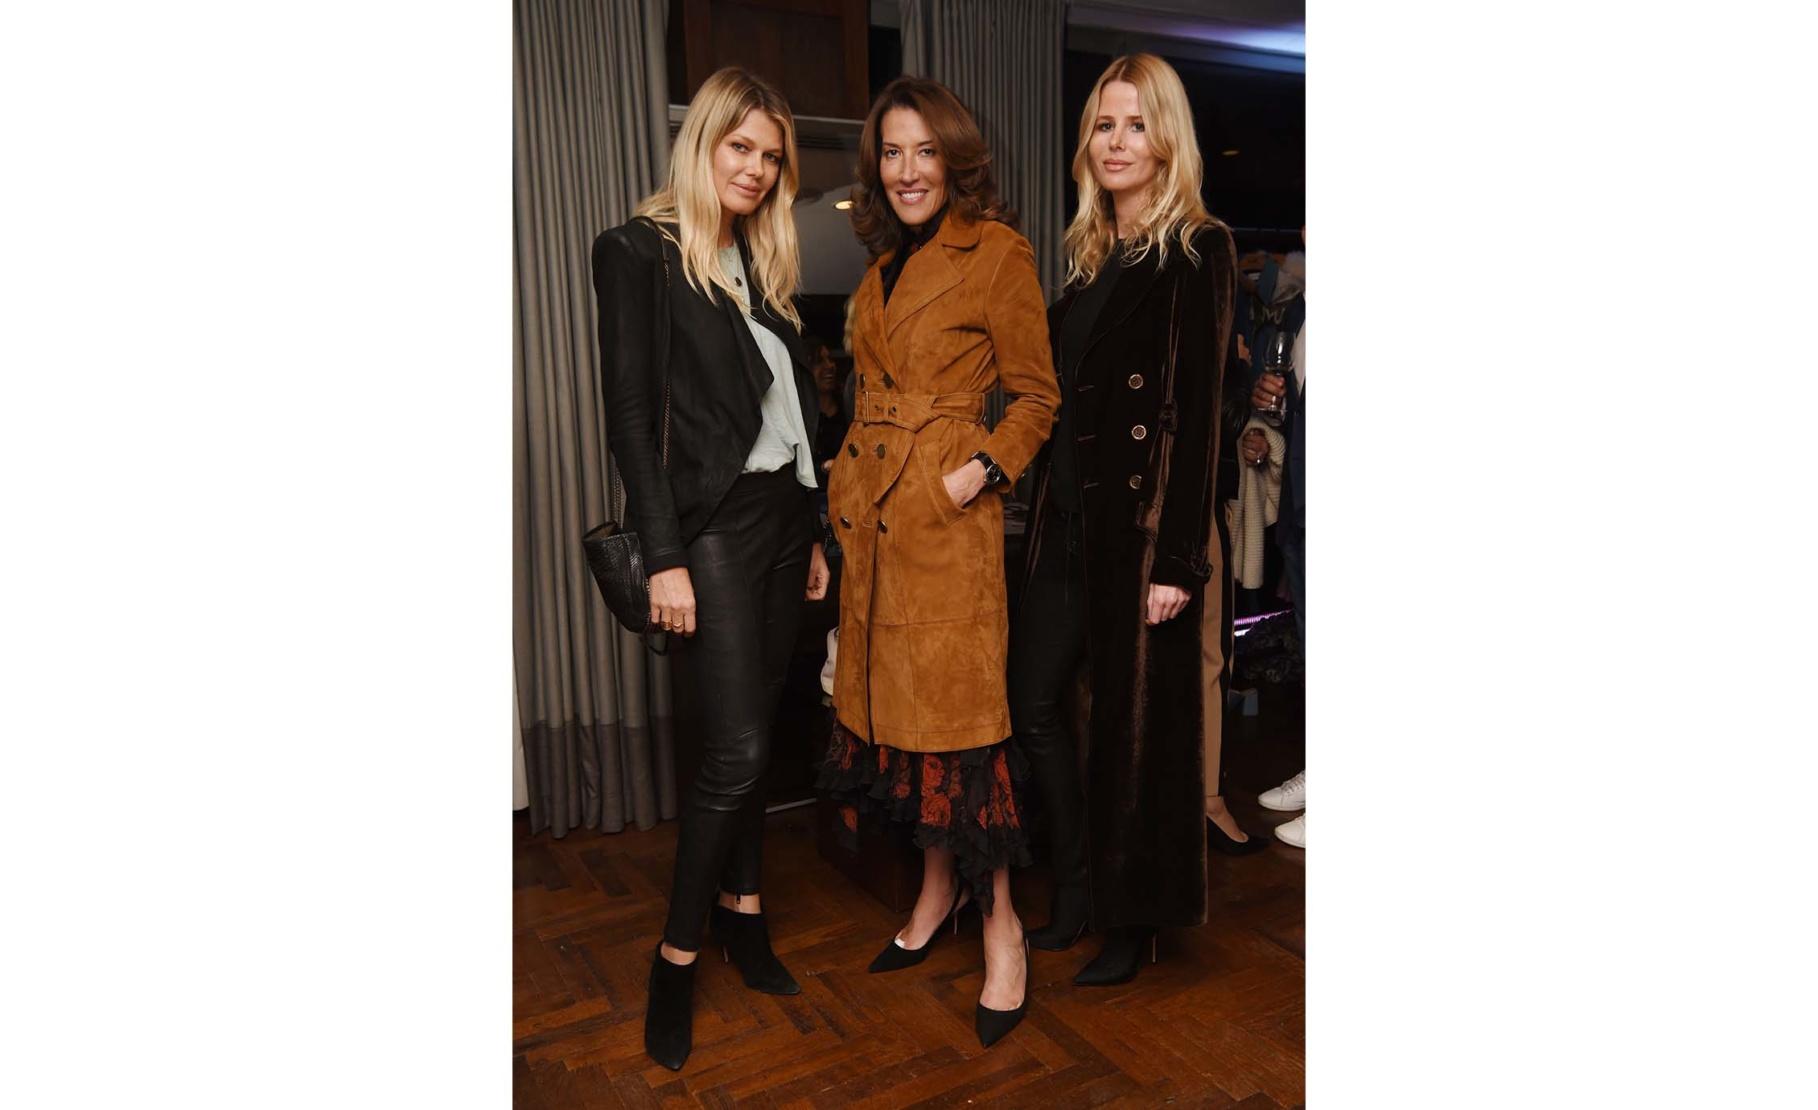 Ingrid Seynhaeve, Laura Dubin-Wander and Ina Lettmann